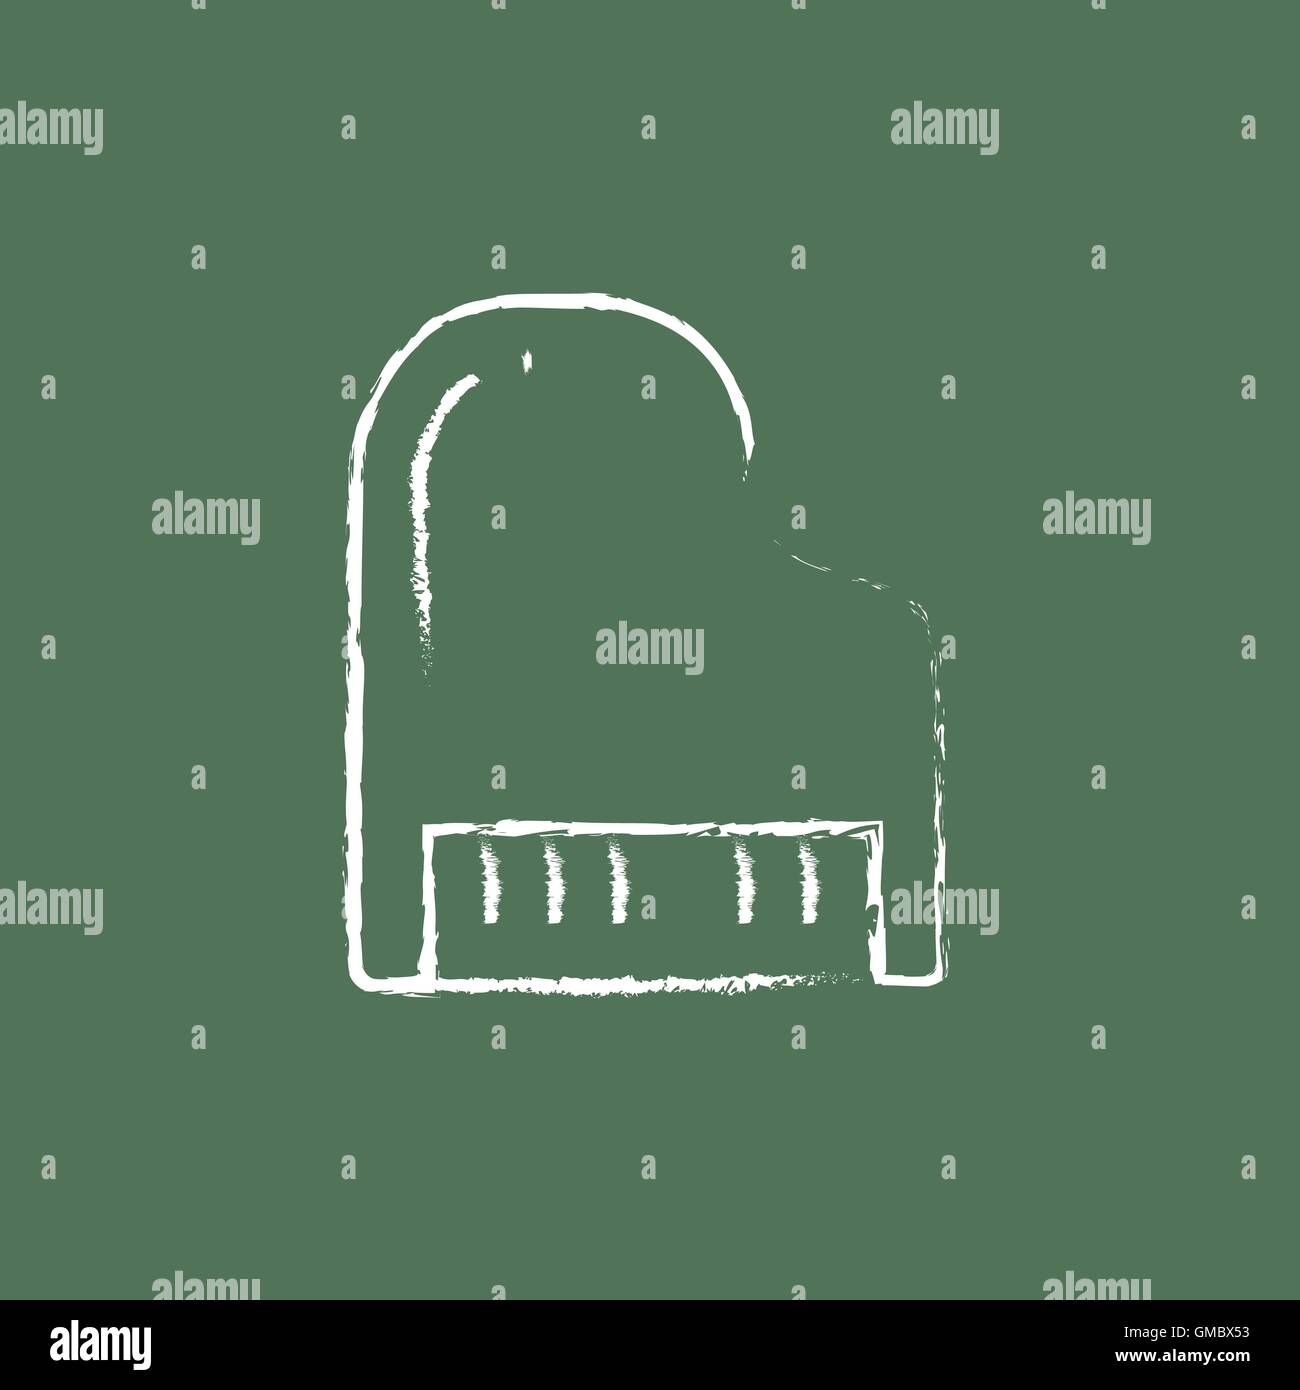 Piano icon drawn in chalk. - Stock Image